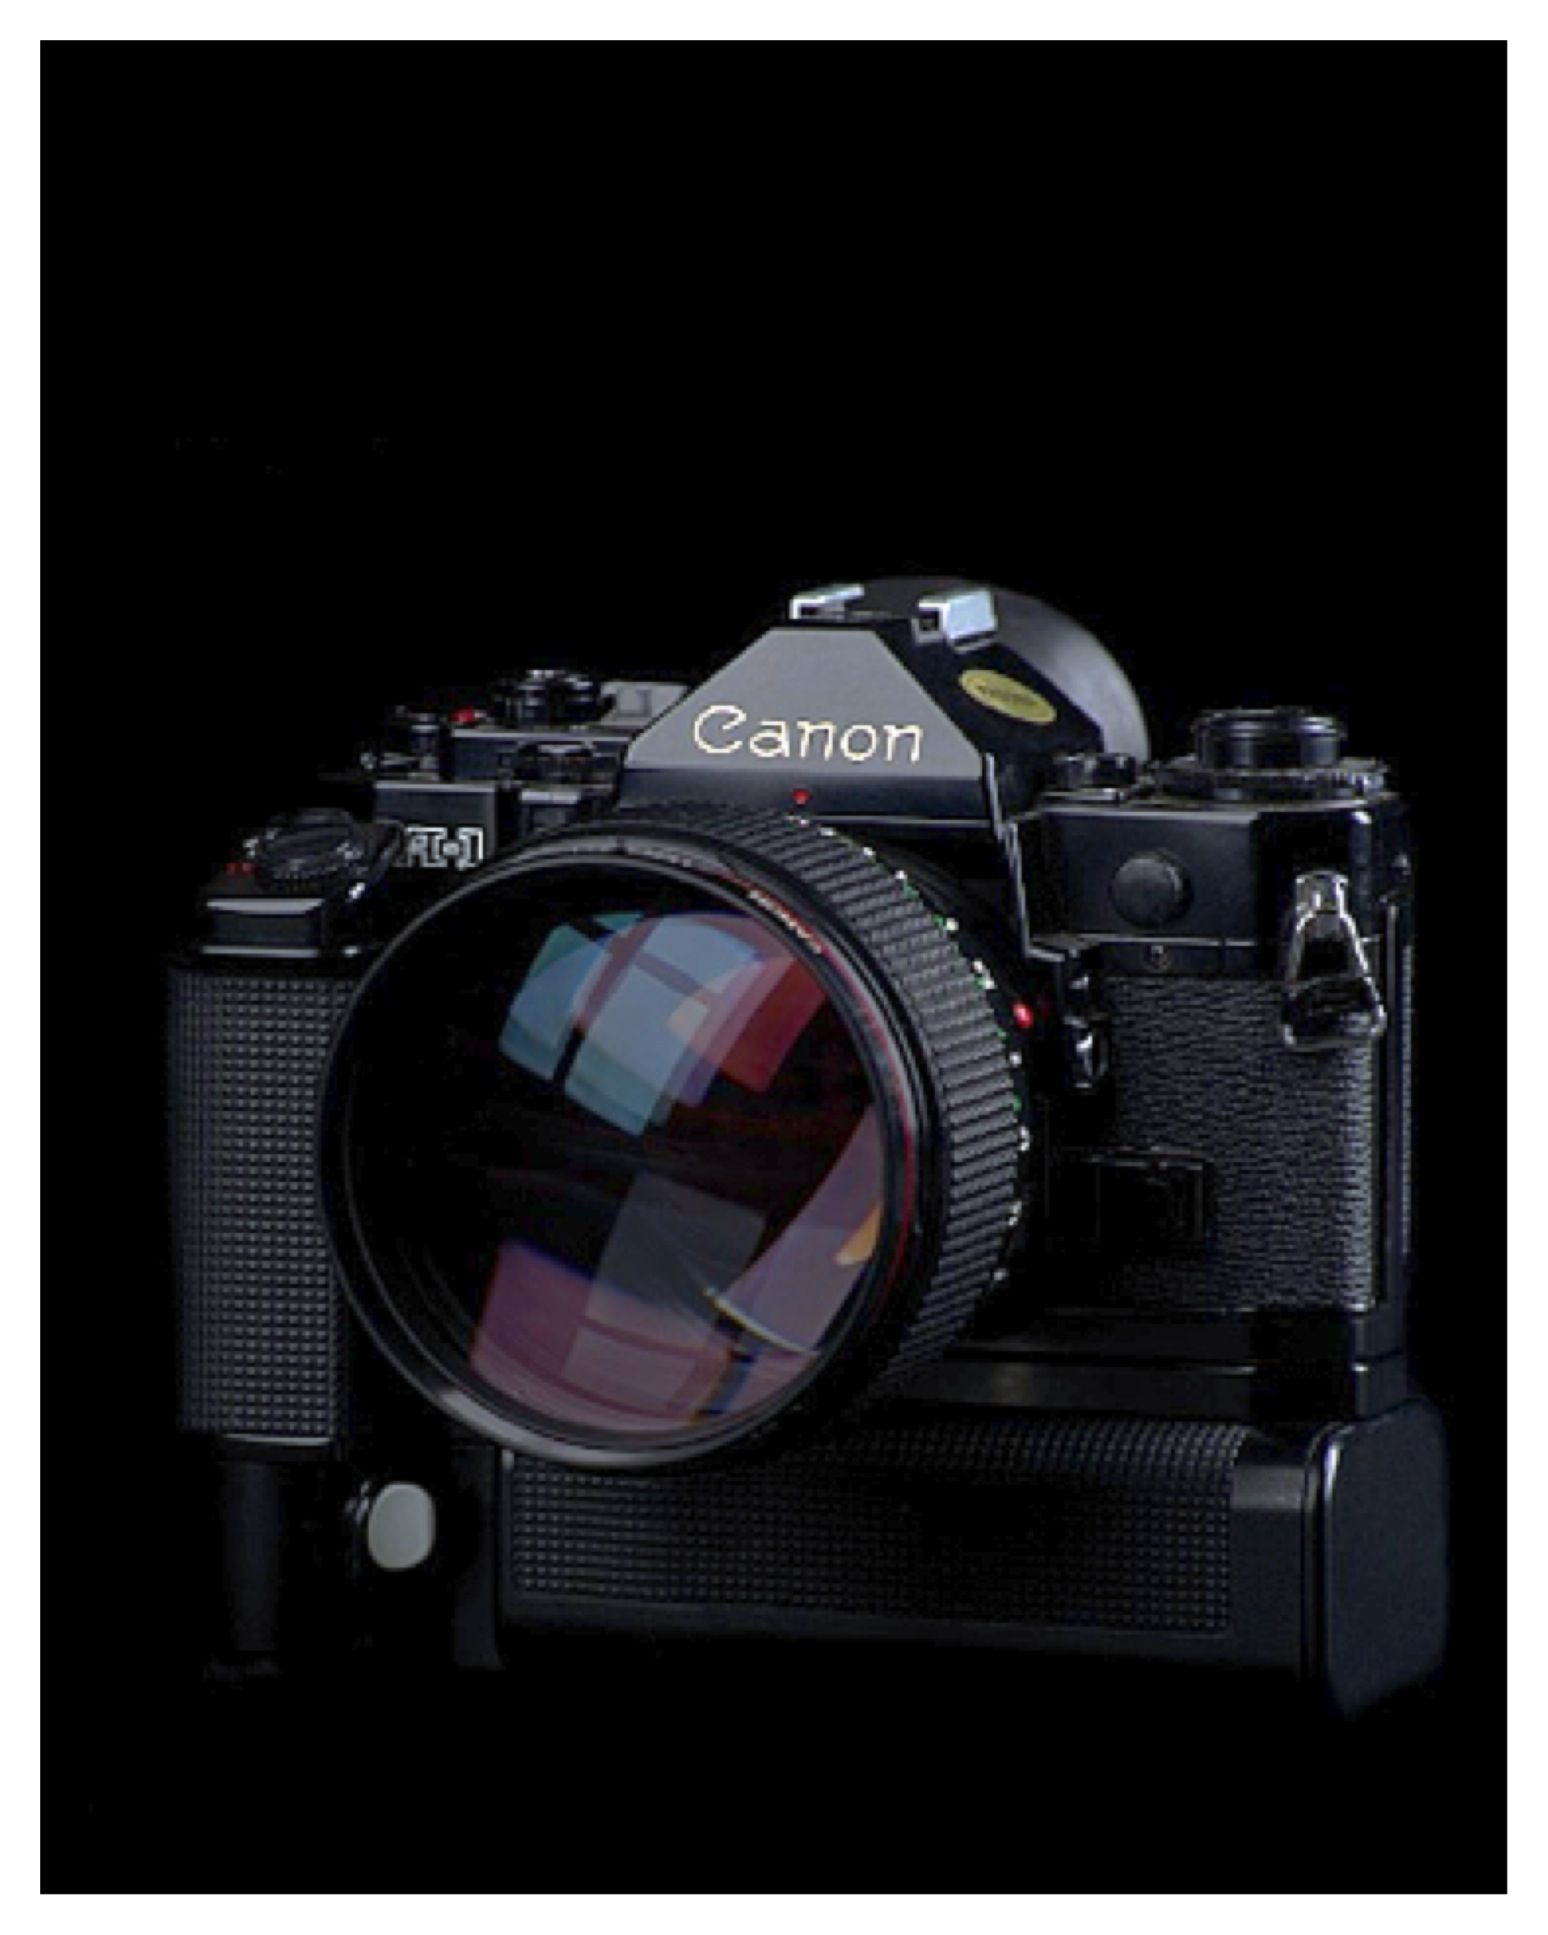 Canon F-1 | Desing_. | Pinterest | Analoga, Cámaras y Me gustas